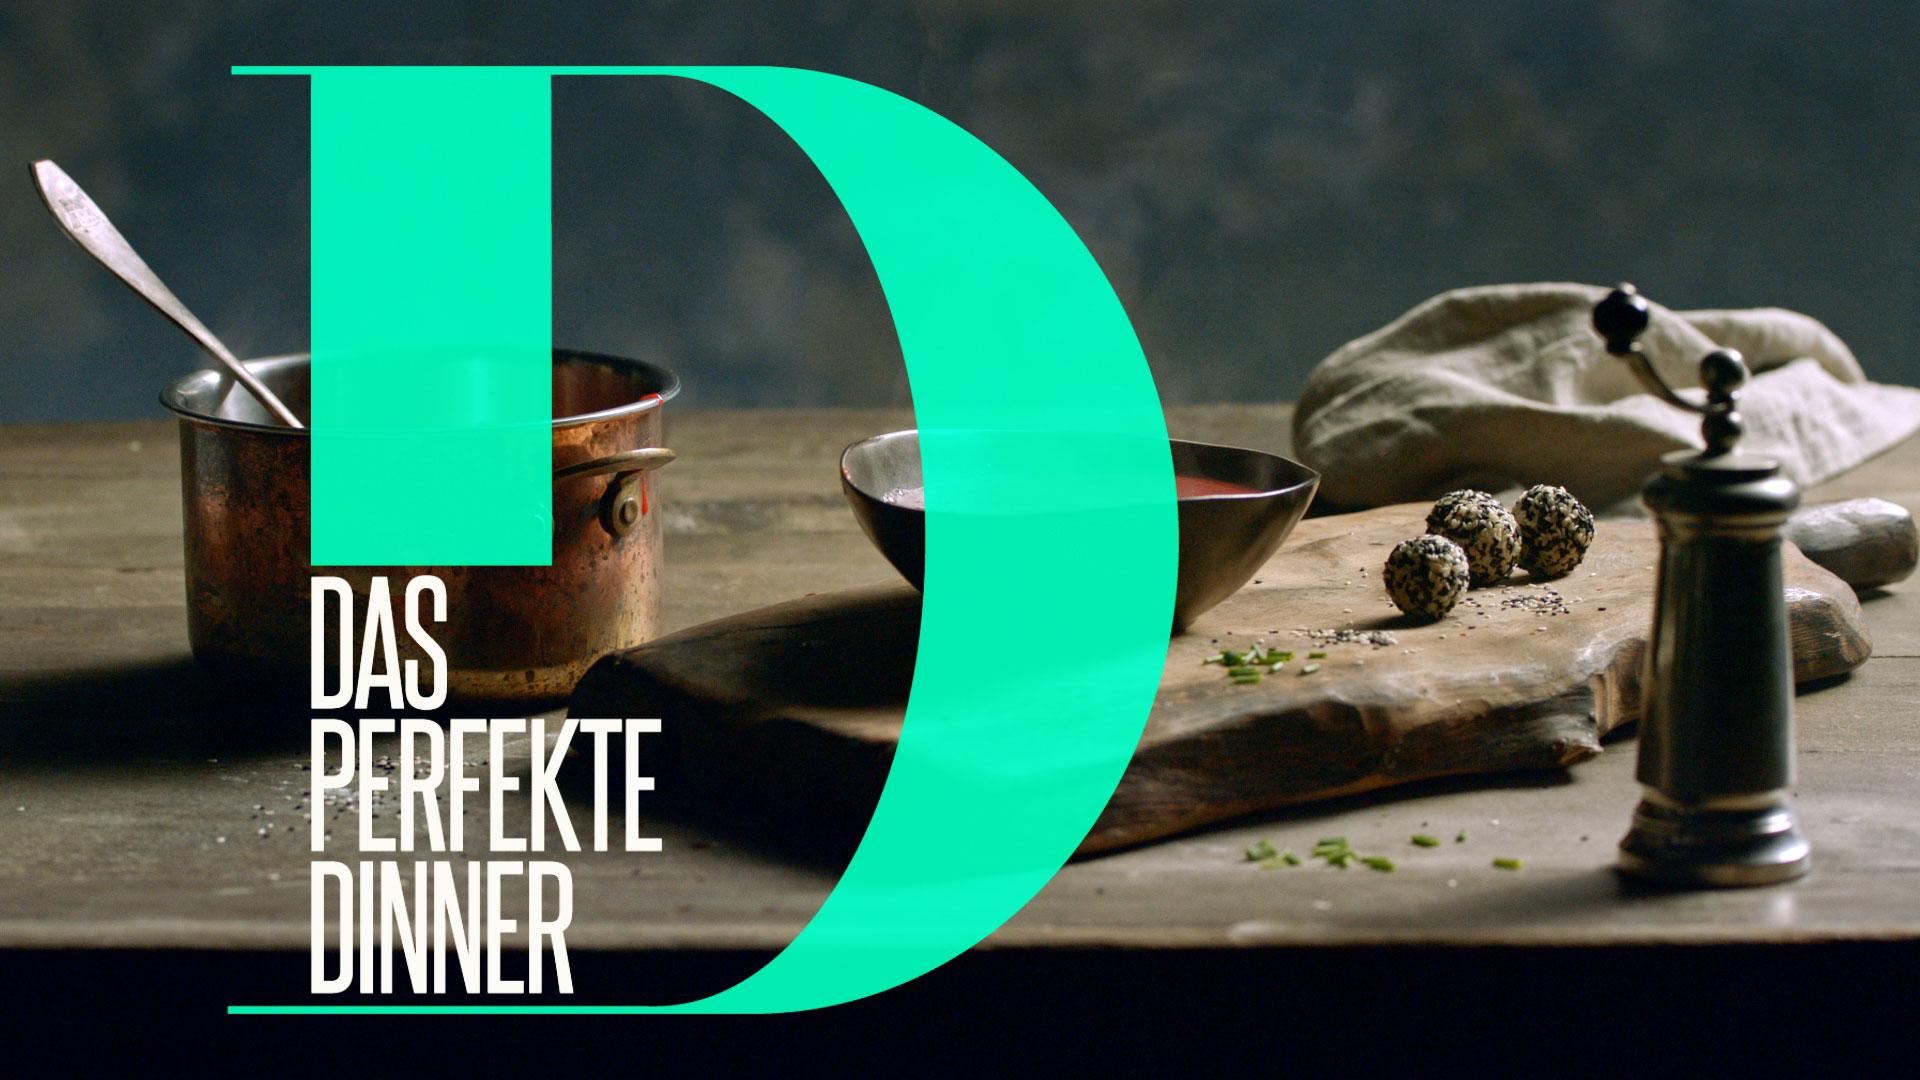 Das perfekte Dinner Logo